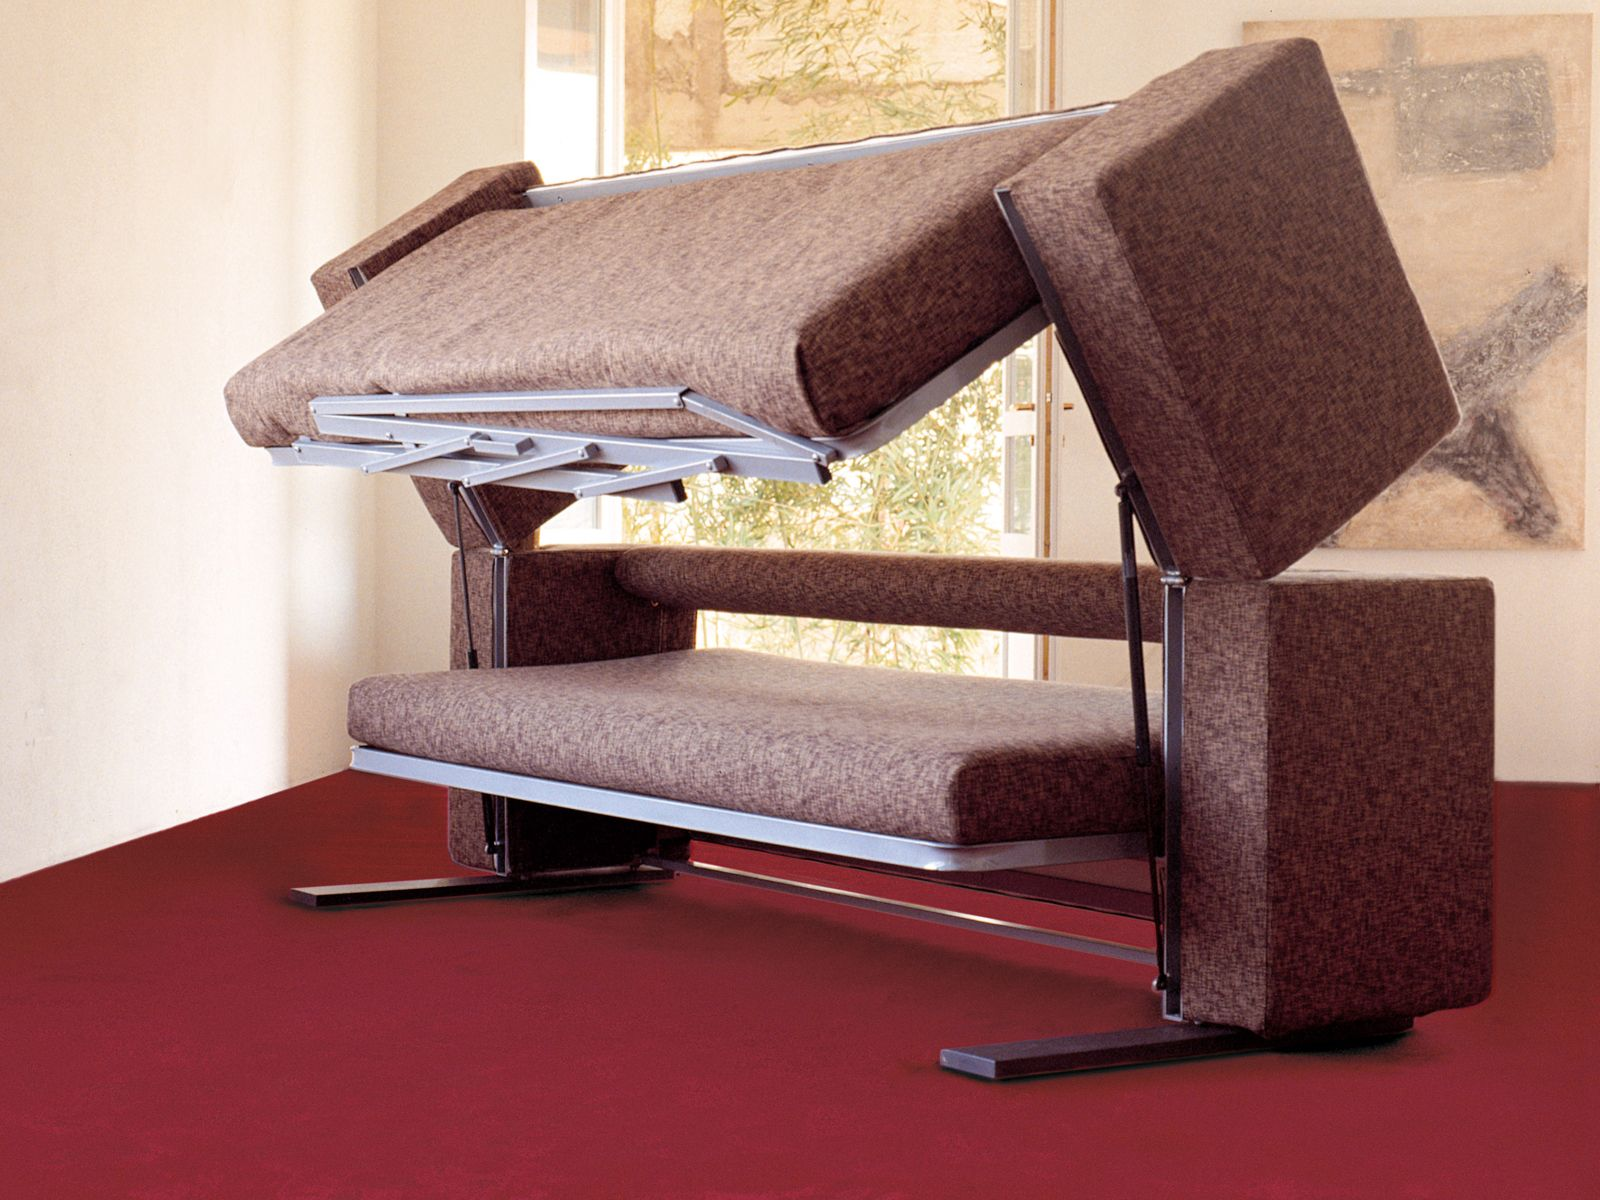 sofa bunk beds by architect giulio manzoni 5 - Doc Sofa Etagenbett Kaufen